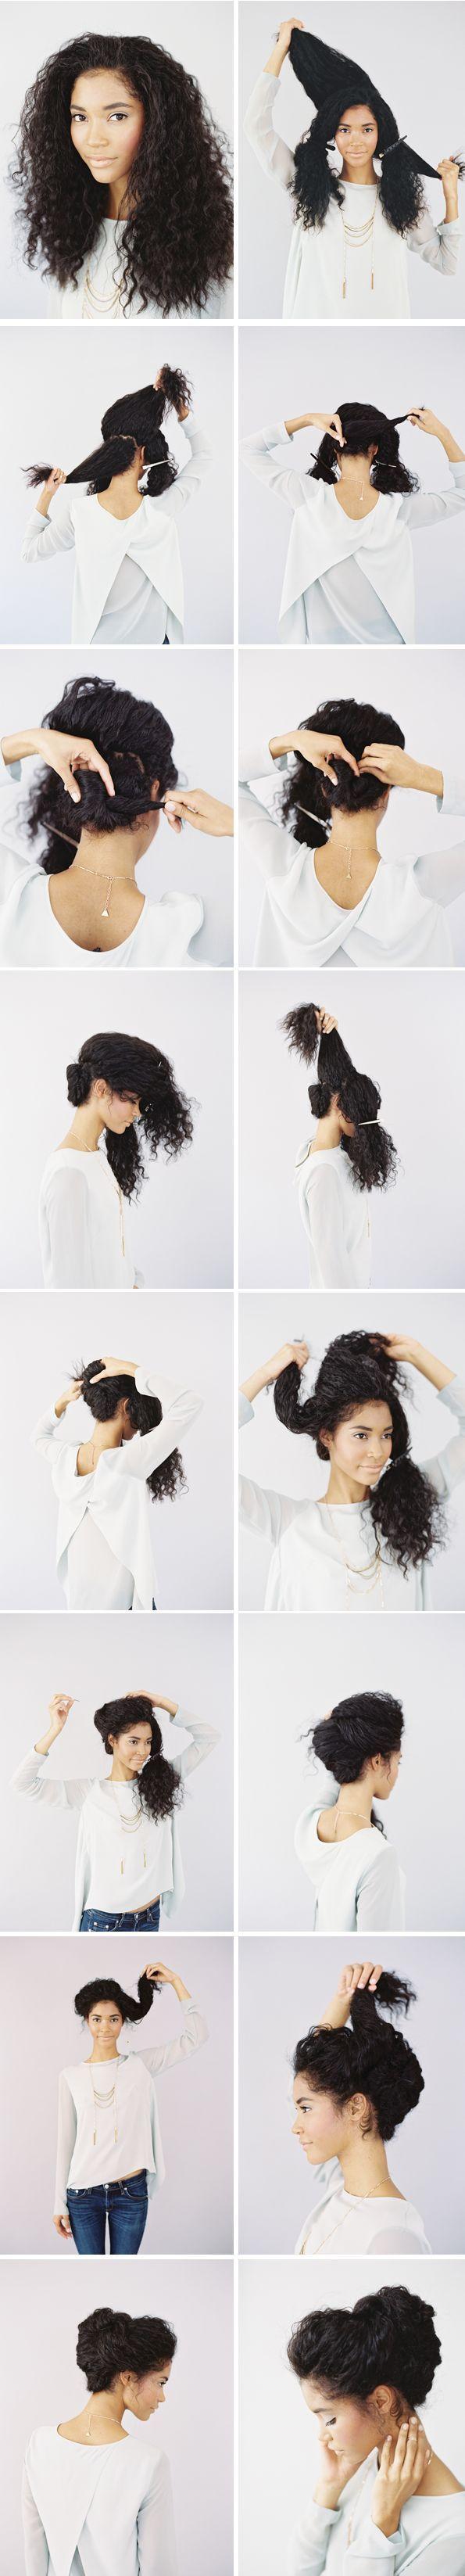 Trendy Hair Style Tuto Coiffure Pour Cheveux Fris S Leading Fashion